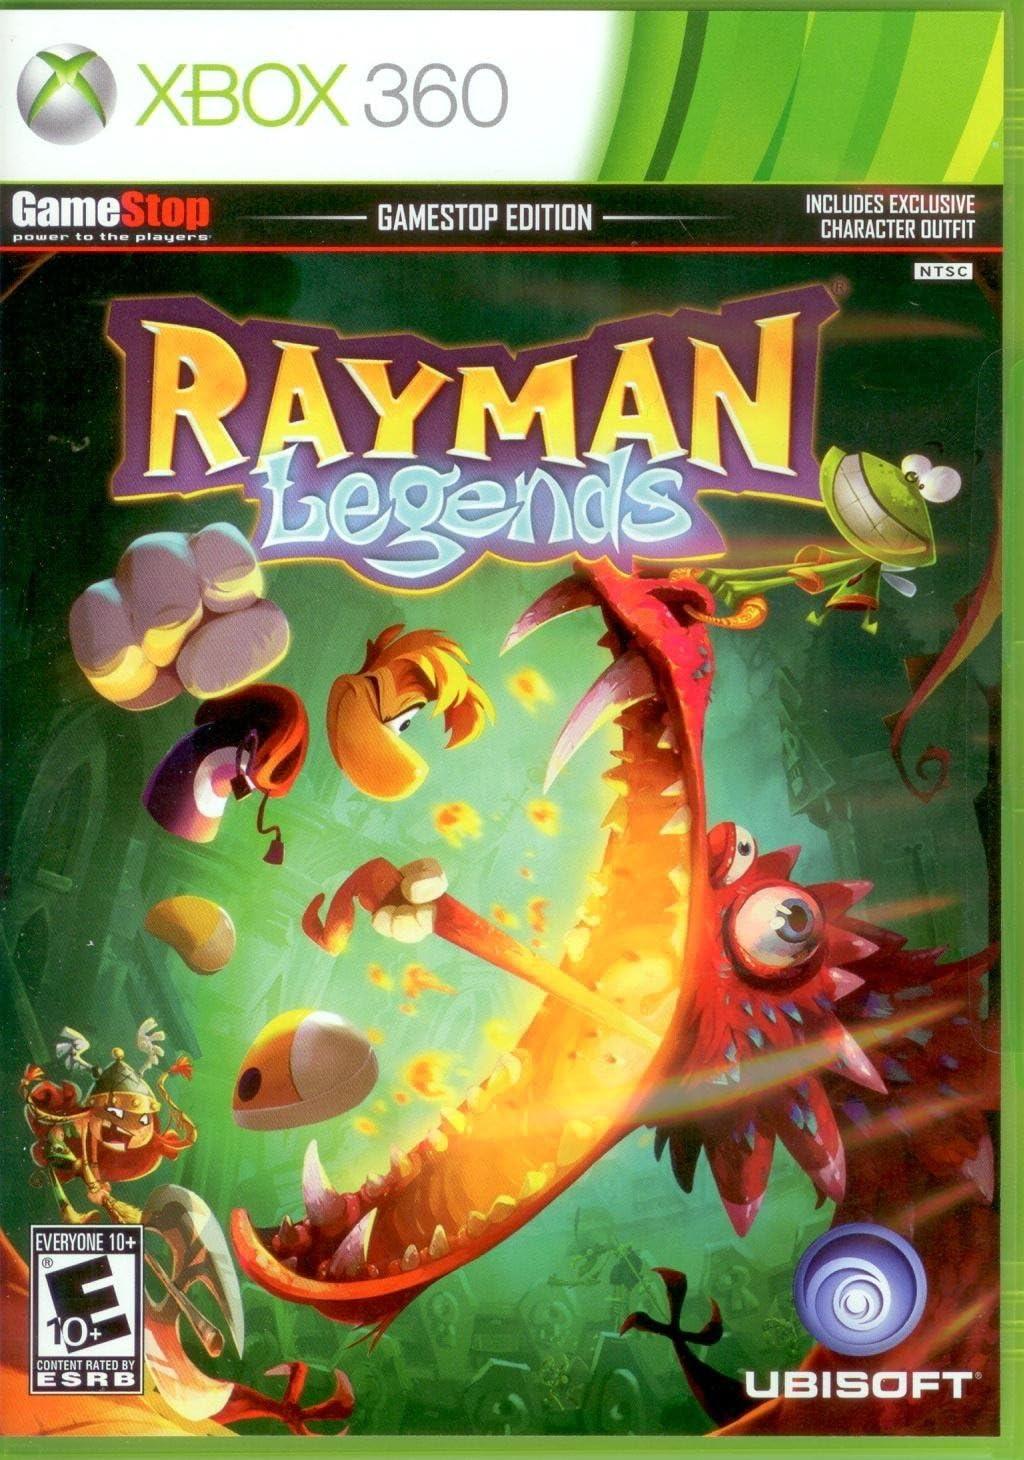 Amazon com: Rayman Legends: Gamestop Edition: Video Games